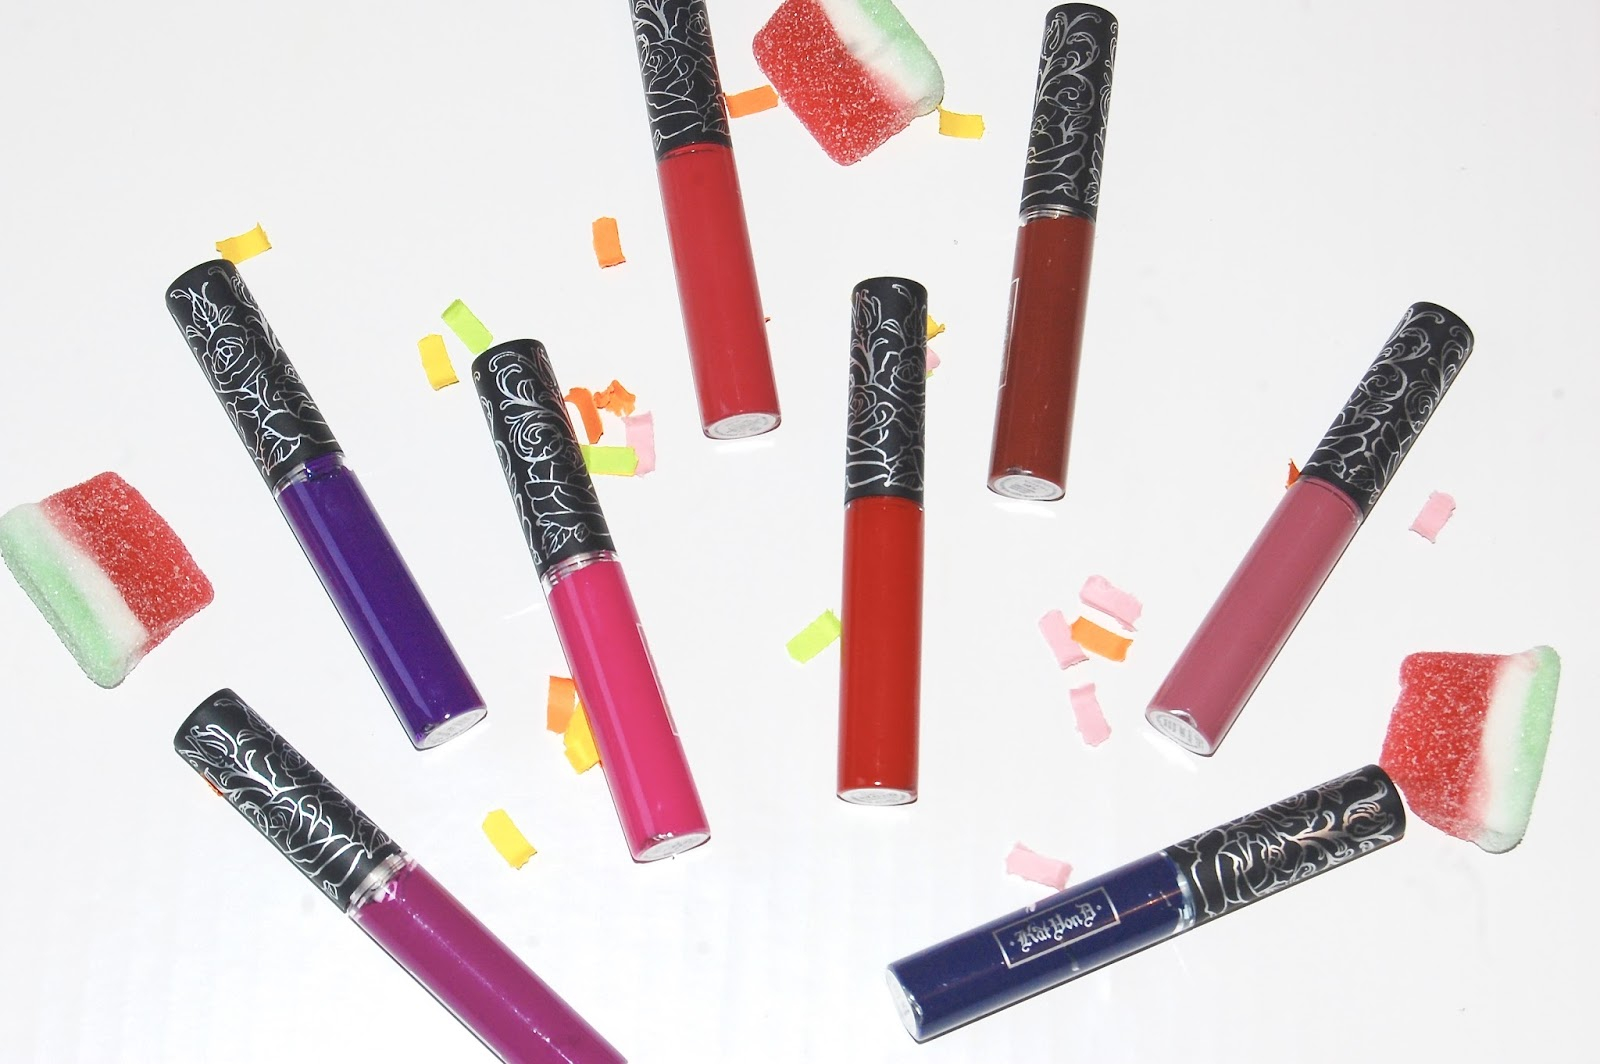 Kat Von D Everlasting Mini Liquid Lipstick Set